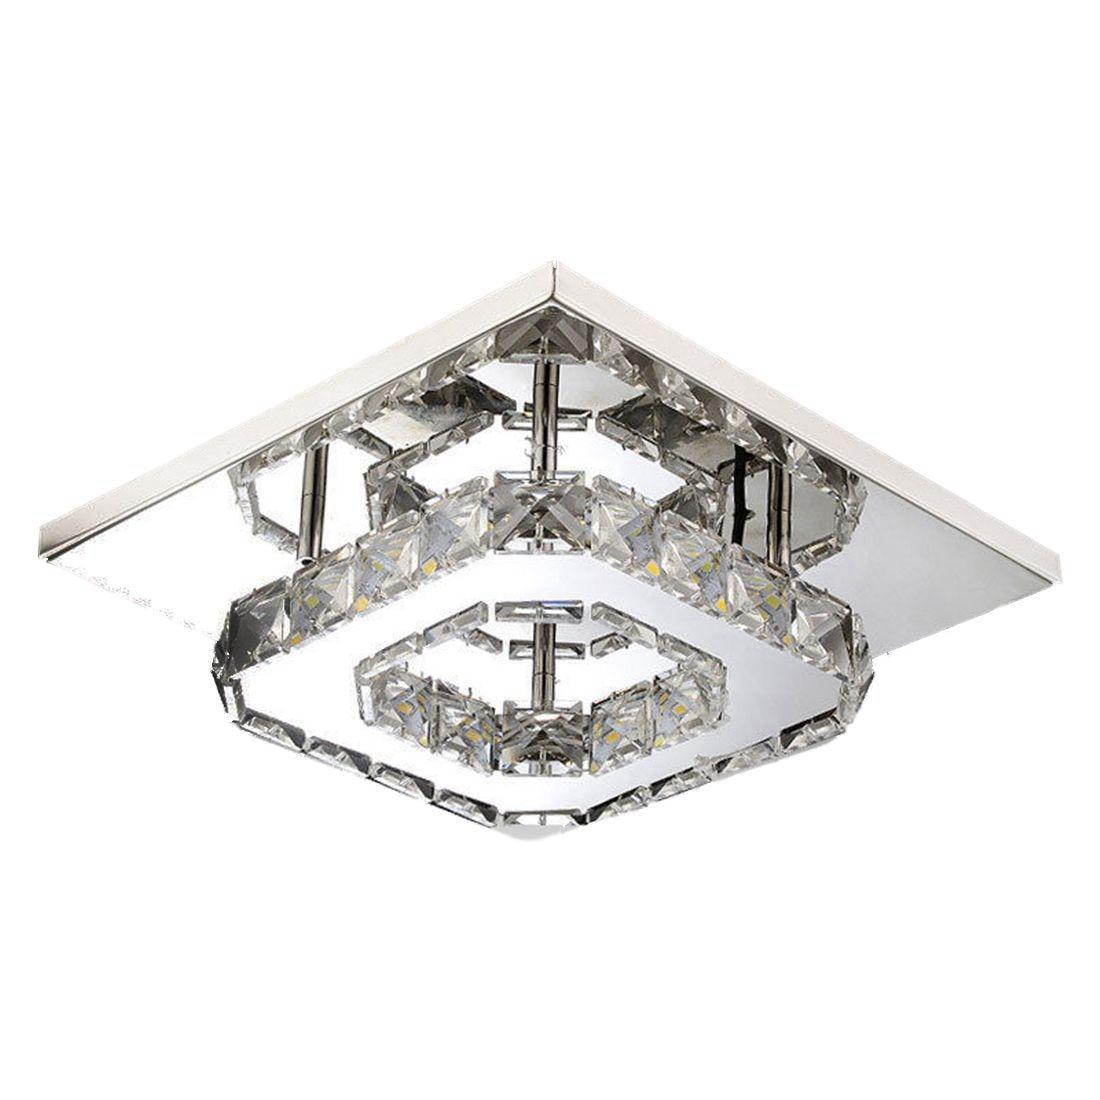 BIFI-20 CM Stainless steel crystal Ceiling Light Corridor Light Crystal Chandelier LED Chandelier Ceiling Lamp Light Chandelie